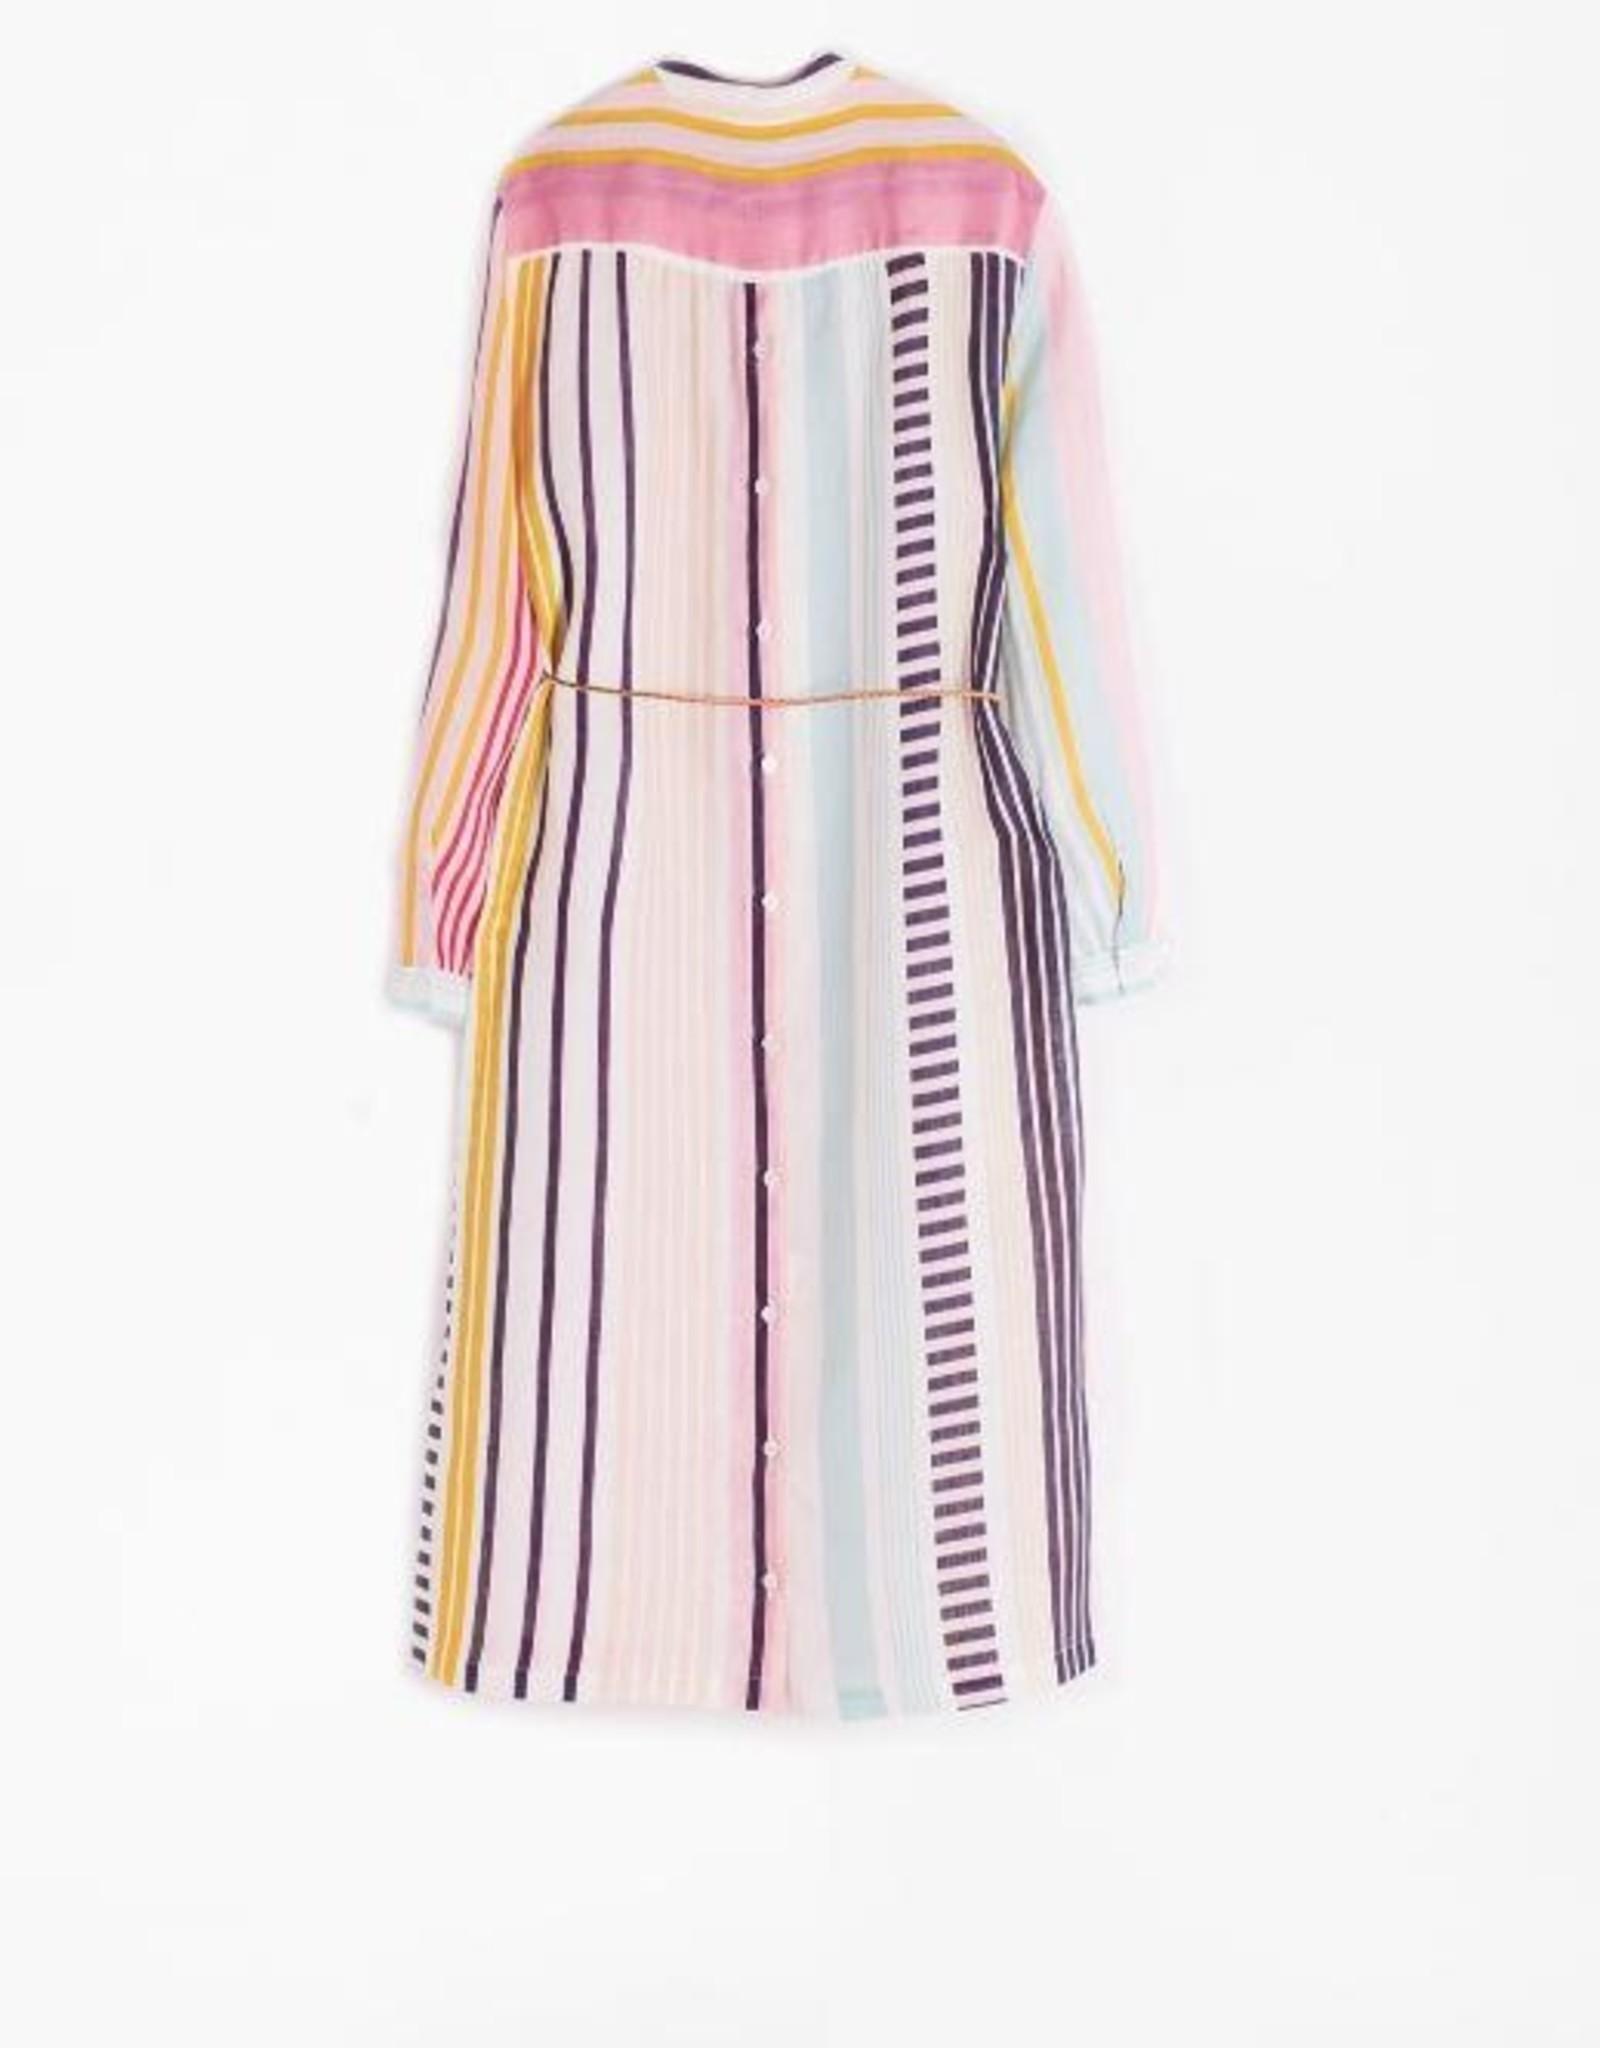 Vilagallo Vilagallo Bianca Boracay Stripe Linen Dress